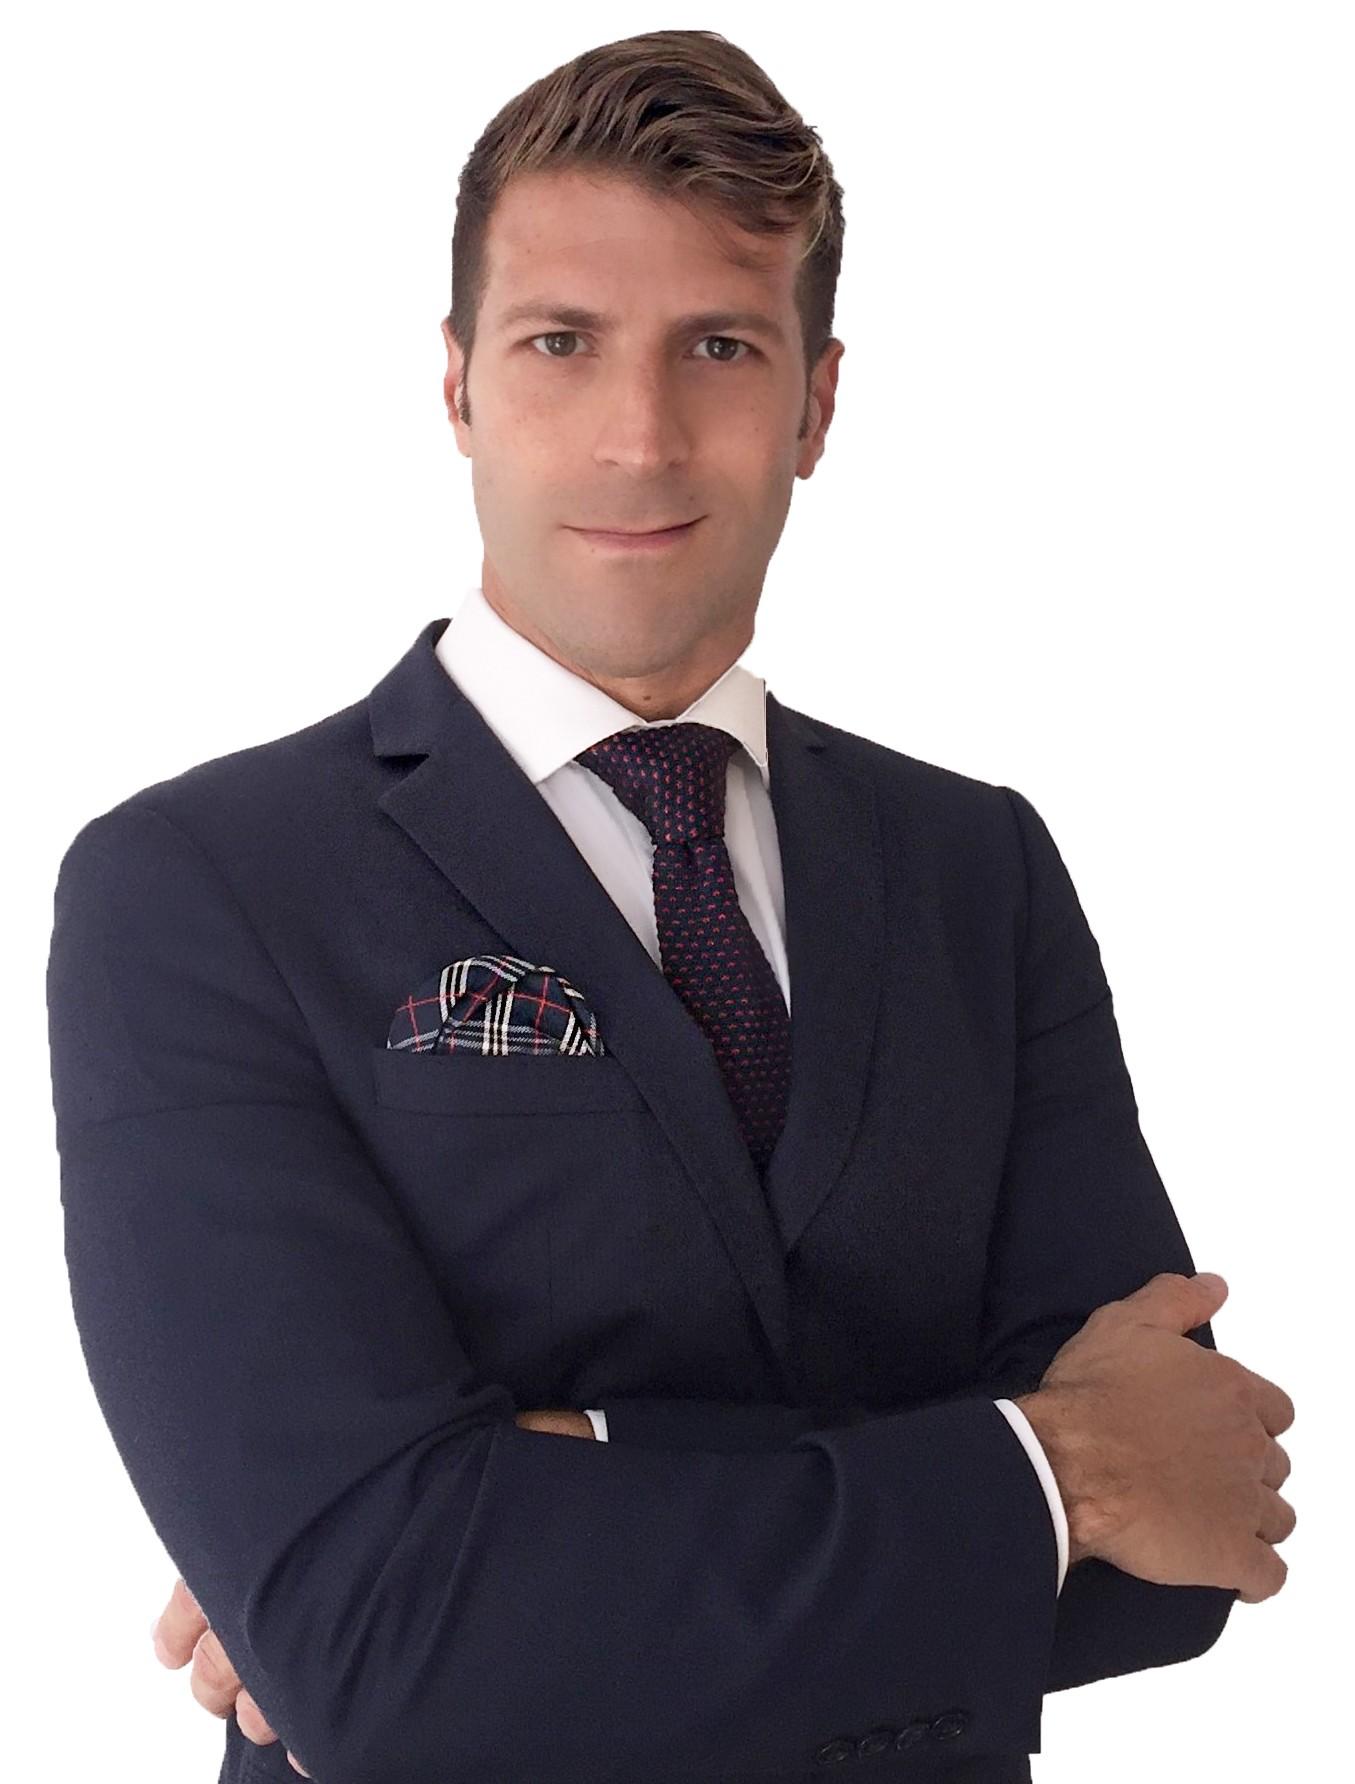 Nelson Jardim Gonçalves